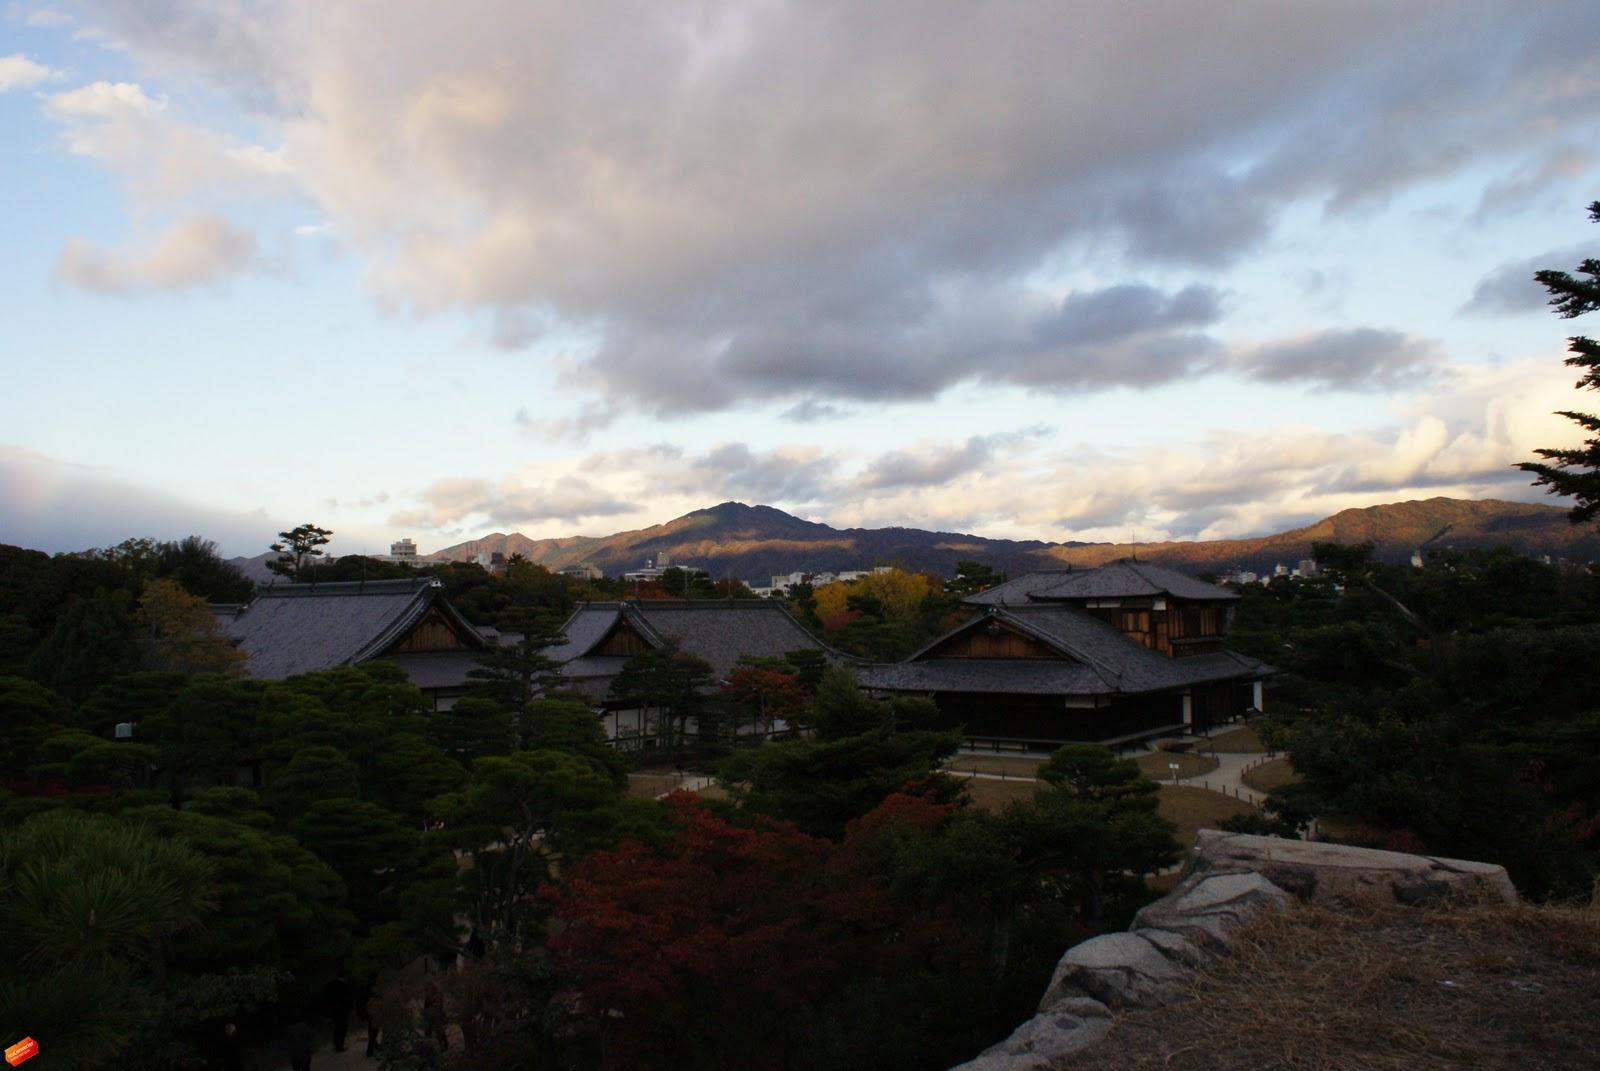 [Resim: Kyoto+%25C4%25B0mparatorluk+Saray%25C4%25B12.jpg]